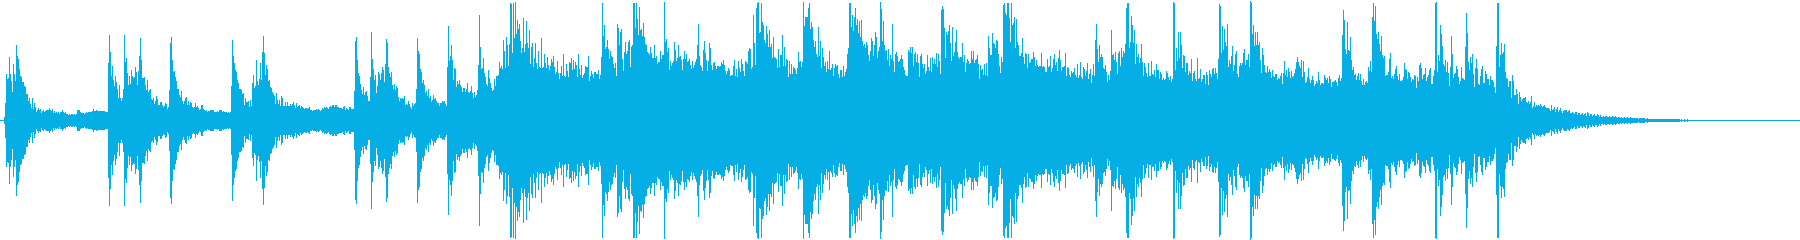 Fanfareの再生済みの波形